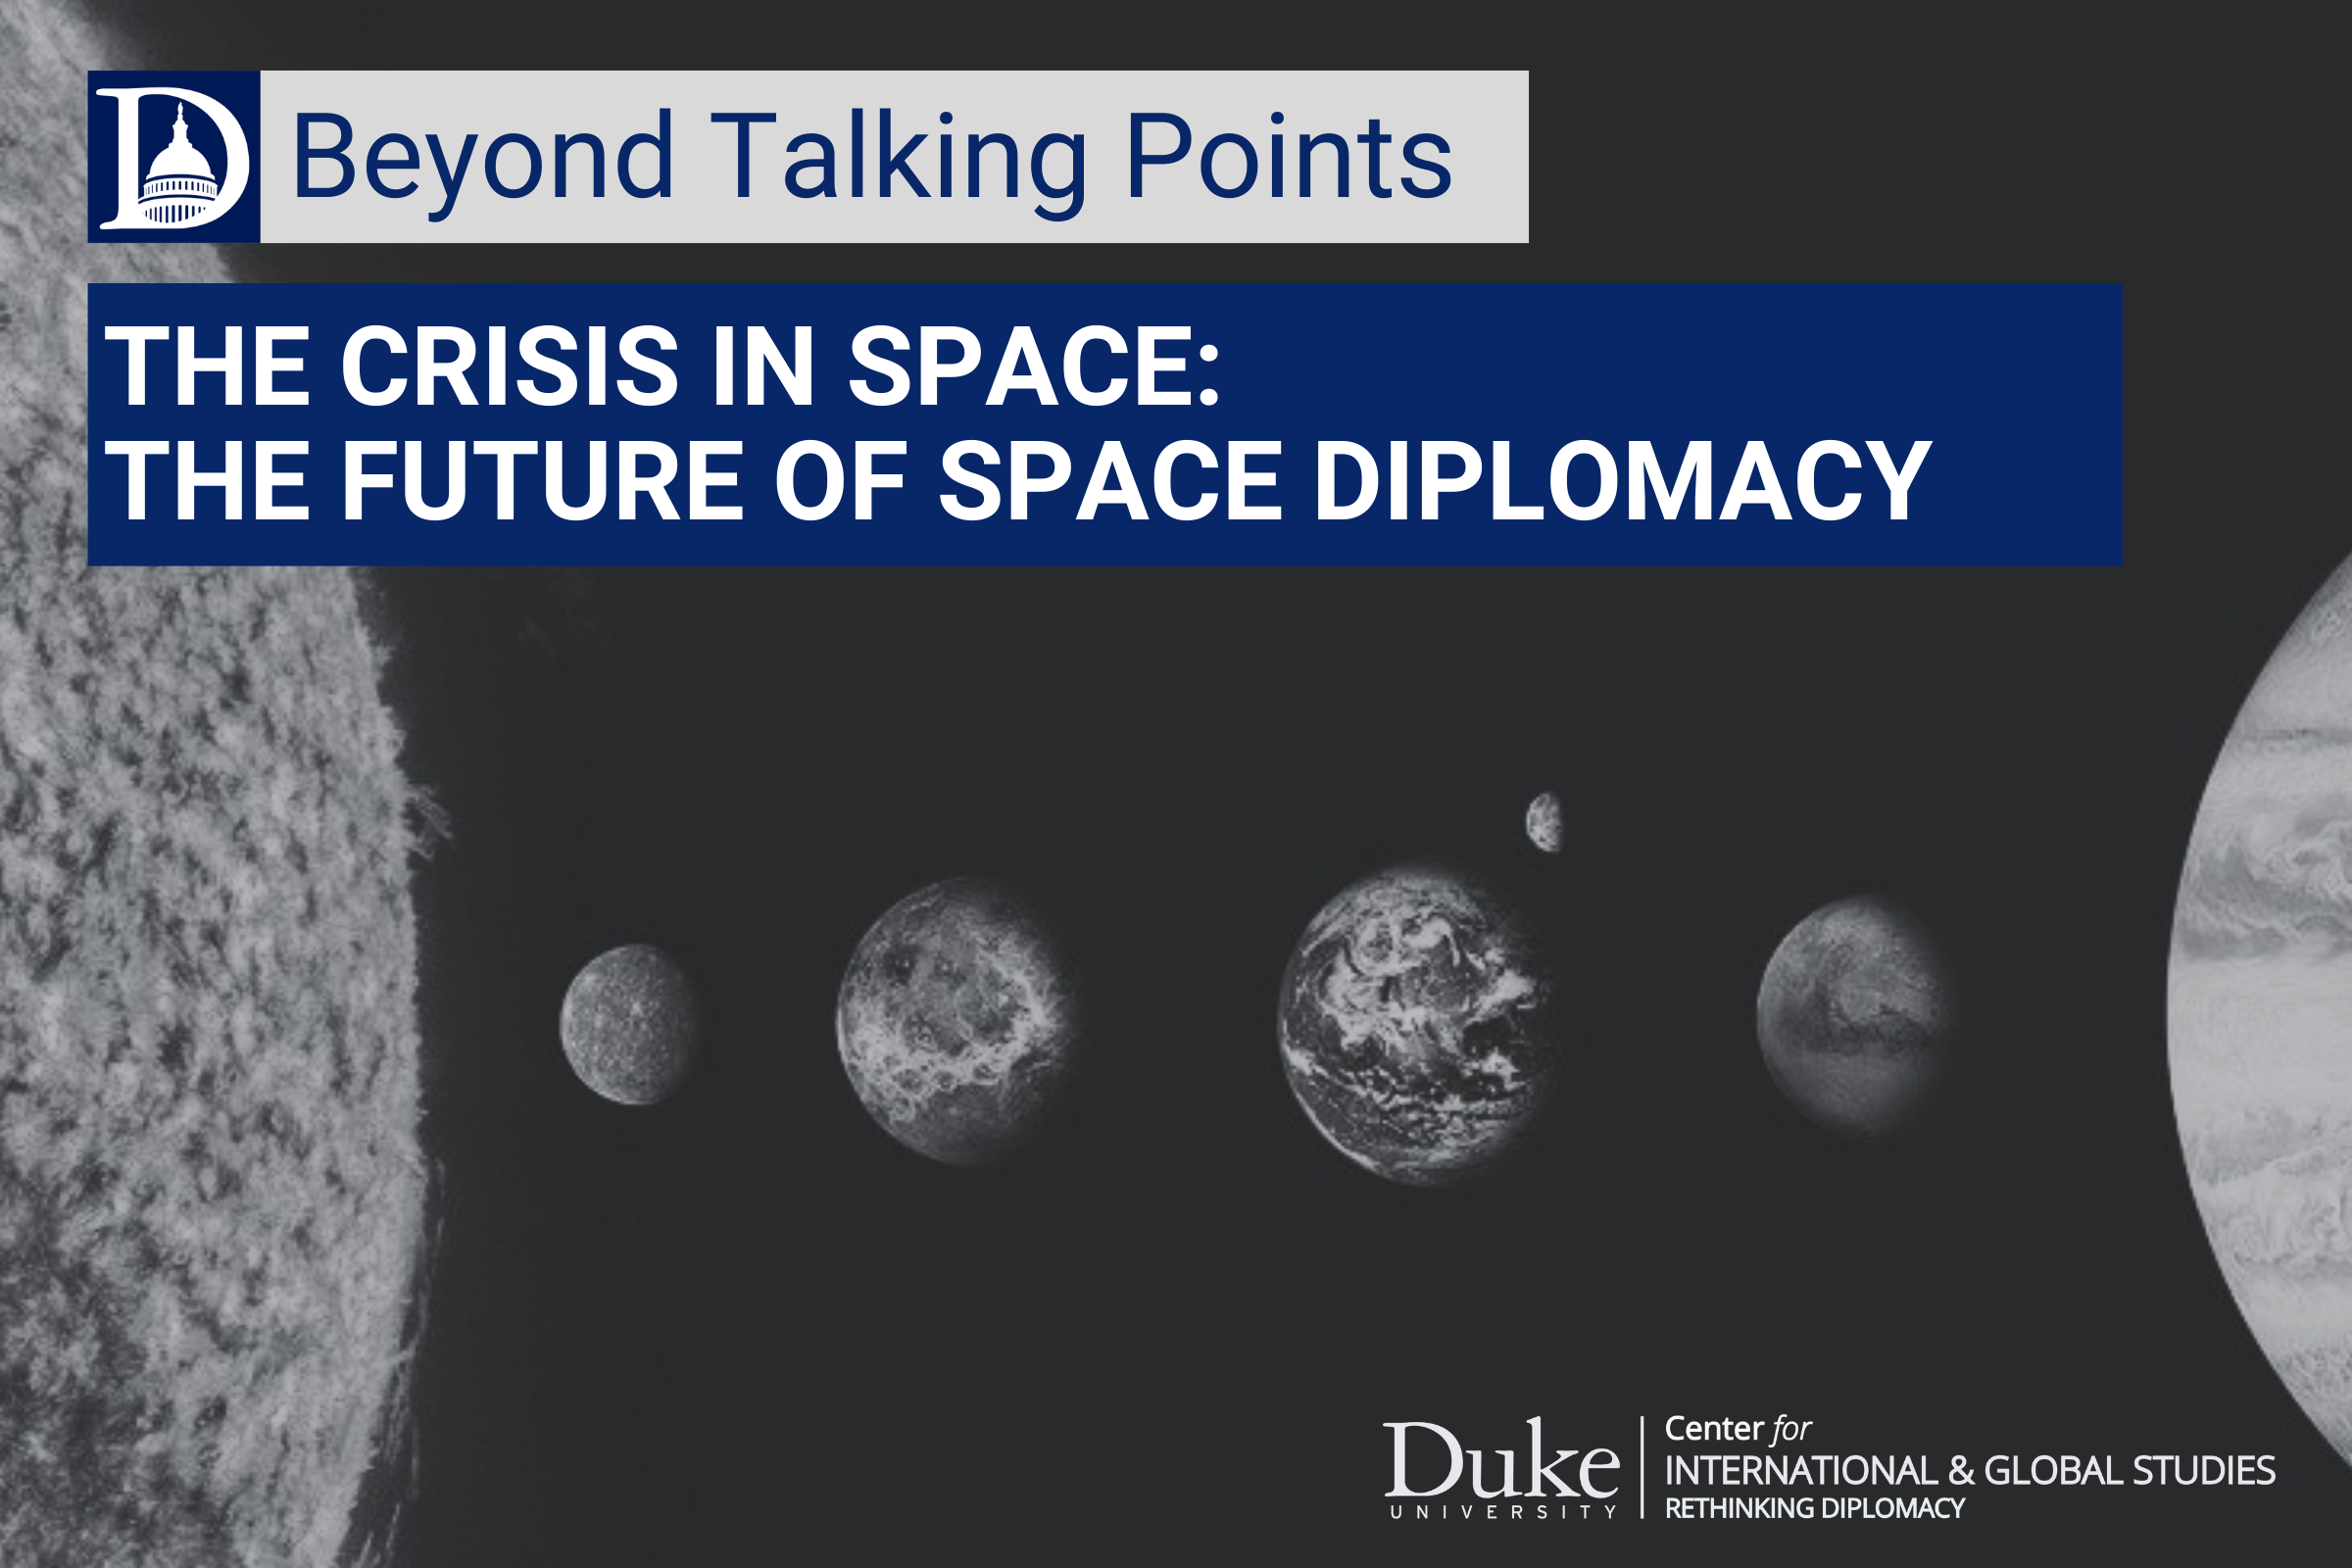 rethinking diplomacy flyer